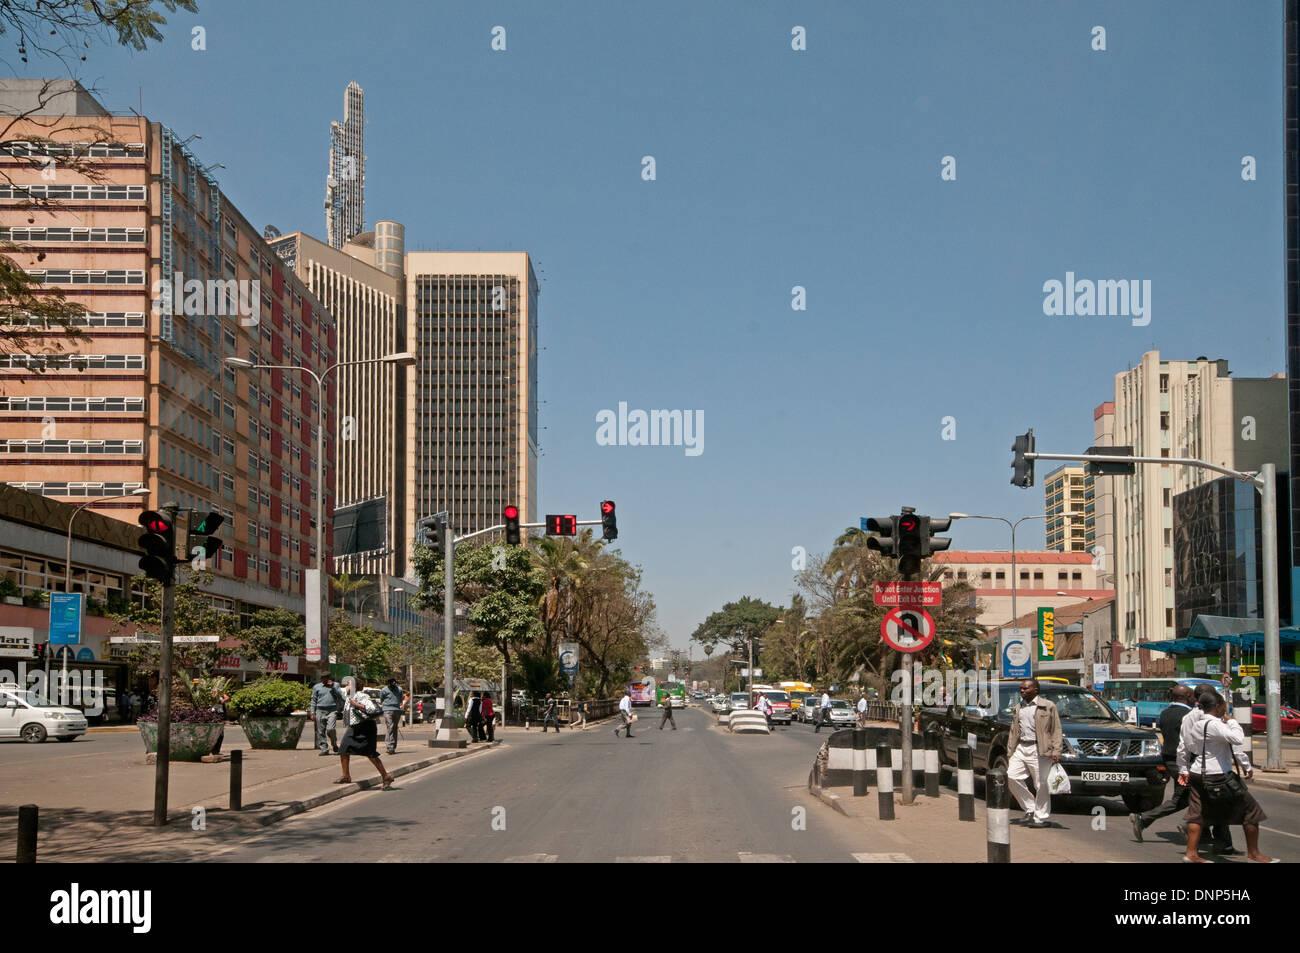 Traffic lights and pedestrians on Kenyatta Avenue Nairobi Kenya with Post Office Tower top left - Stock Image